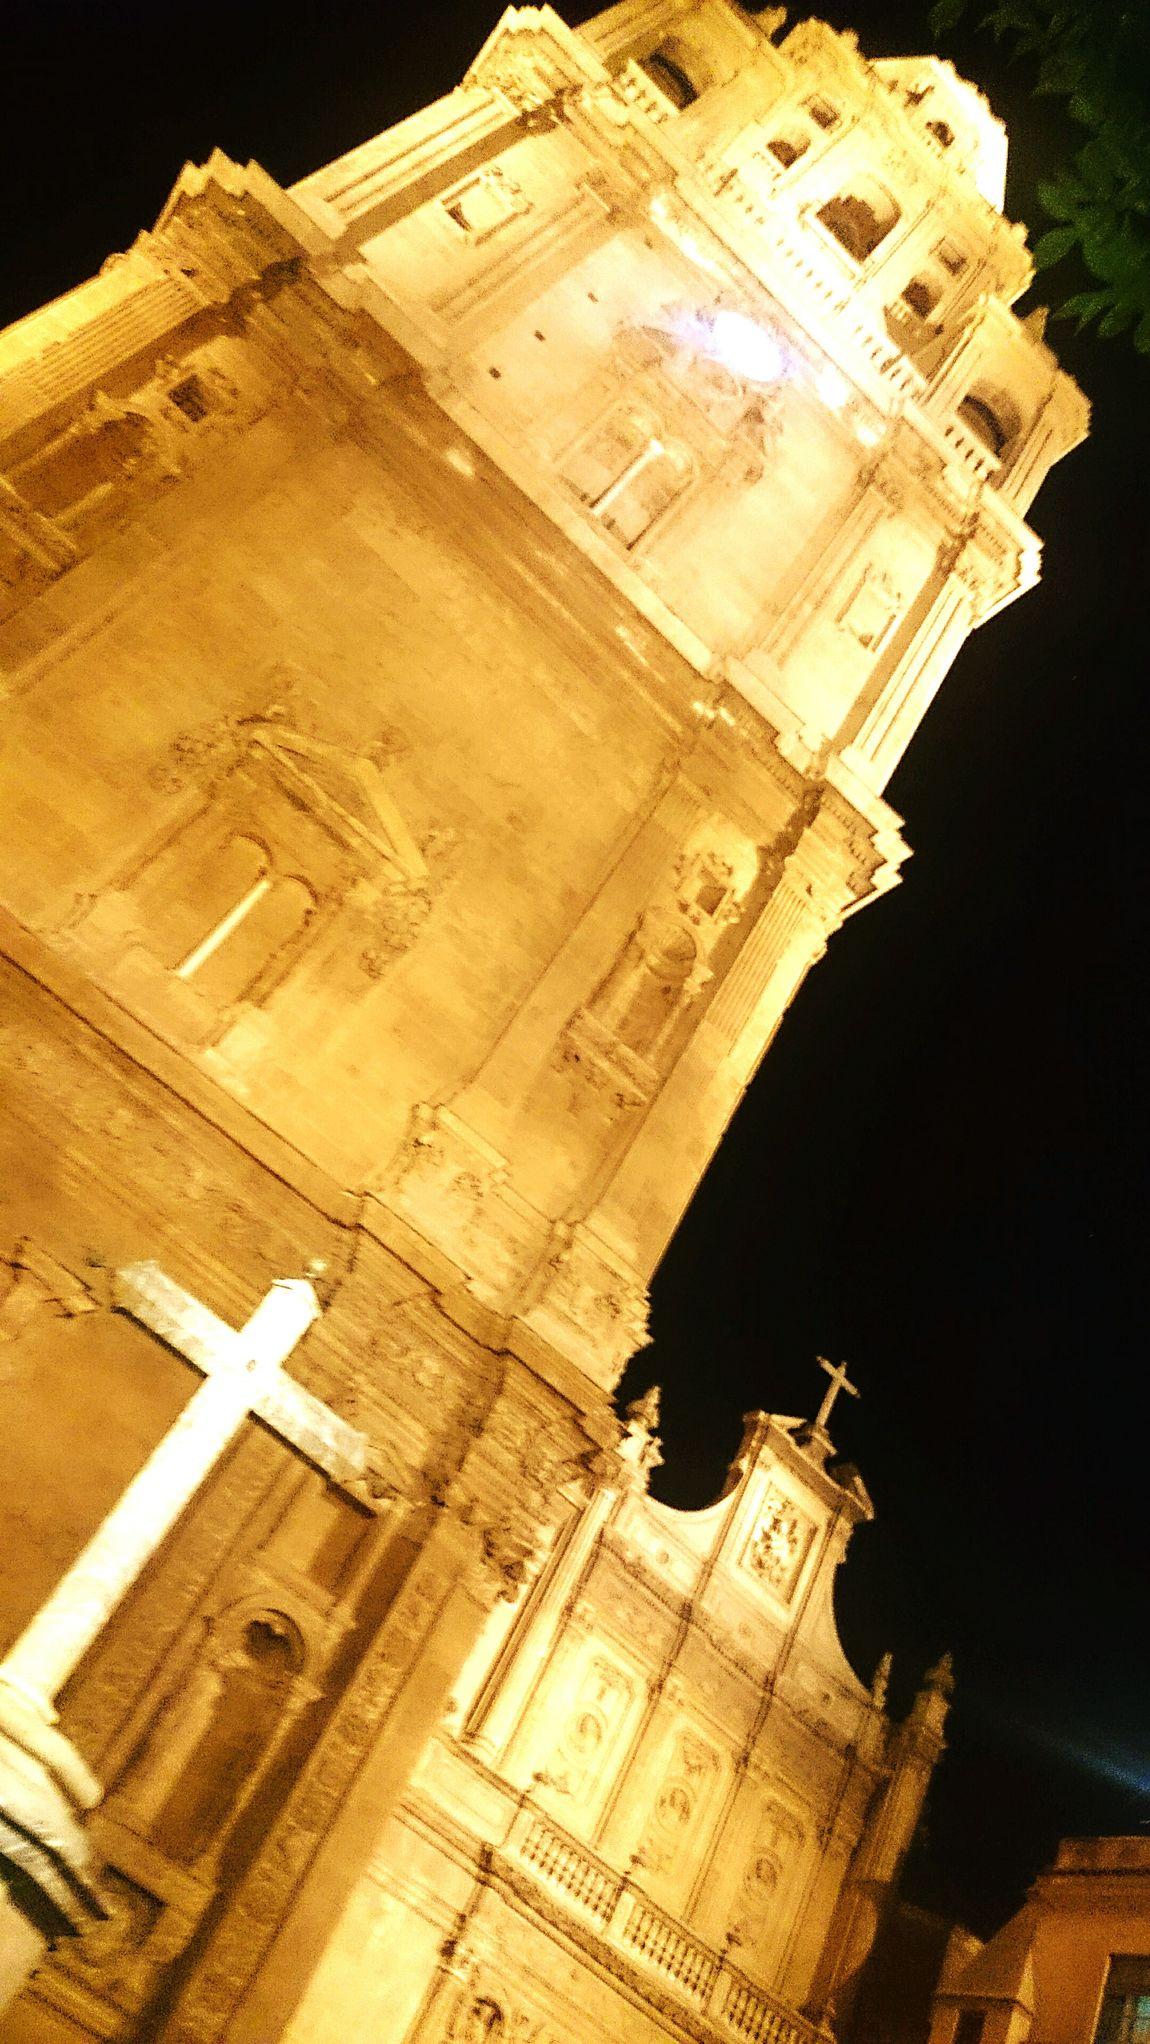 Murcia Catedral De Murcia Murcia City Murcia Time Murcianeando Thisismurcia Walking Around Street Photography